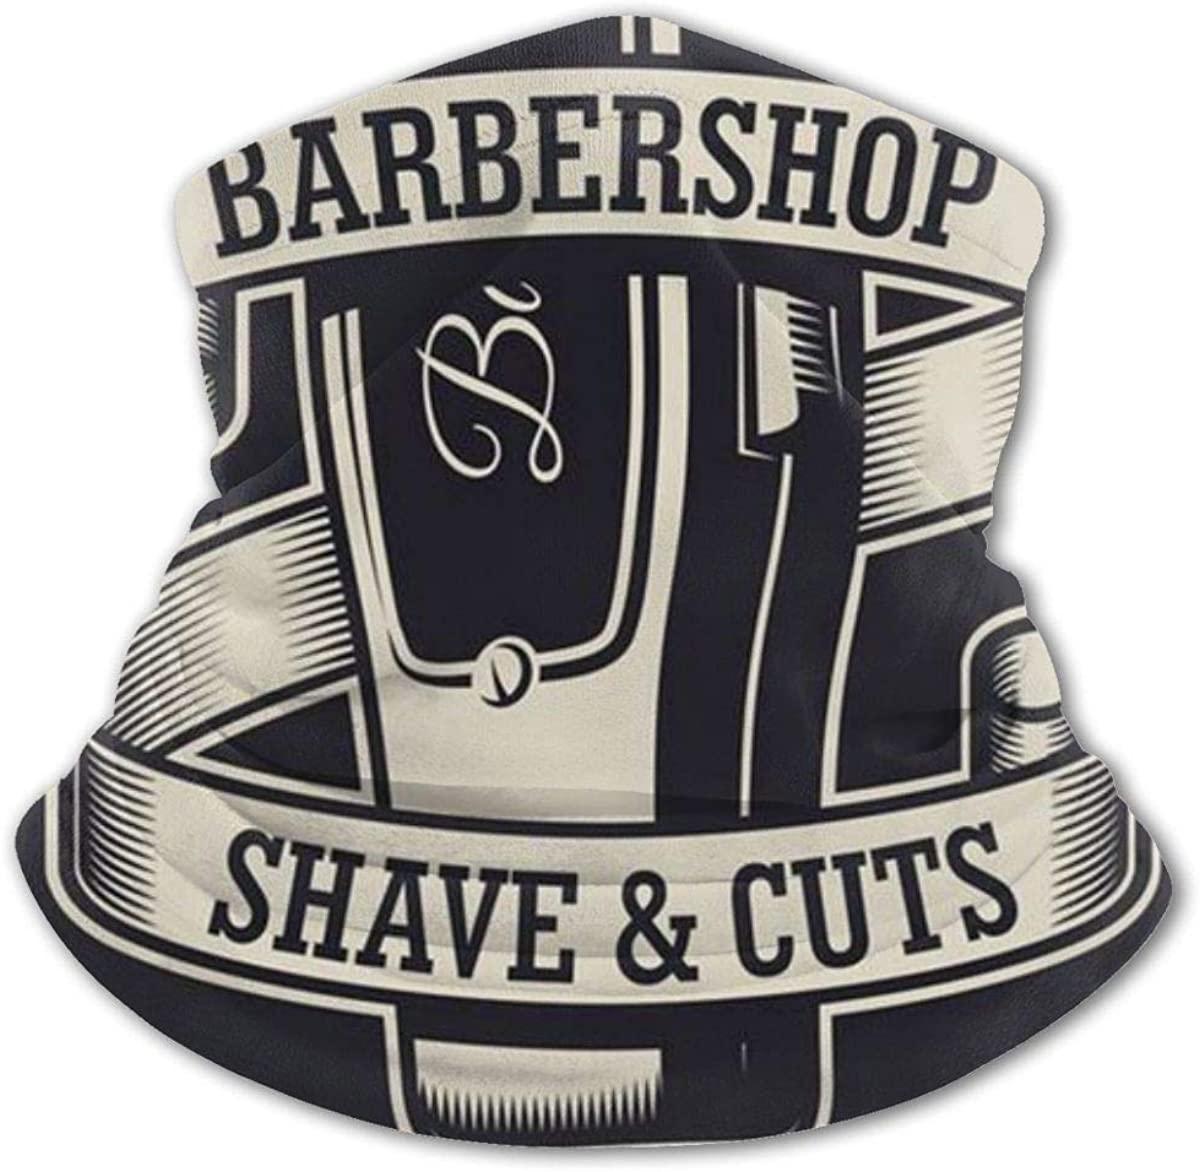 Barbershop Shaver Headwear For Girls And Boys, Head Wrap, Neck Gaiter, Headband, Tenn Fishing Mask, Magic Scarf, Tube Mask, Face Bandana Mask For Camping Running Cycling